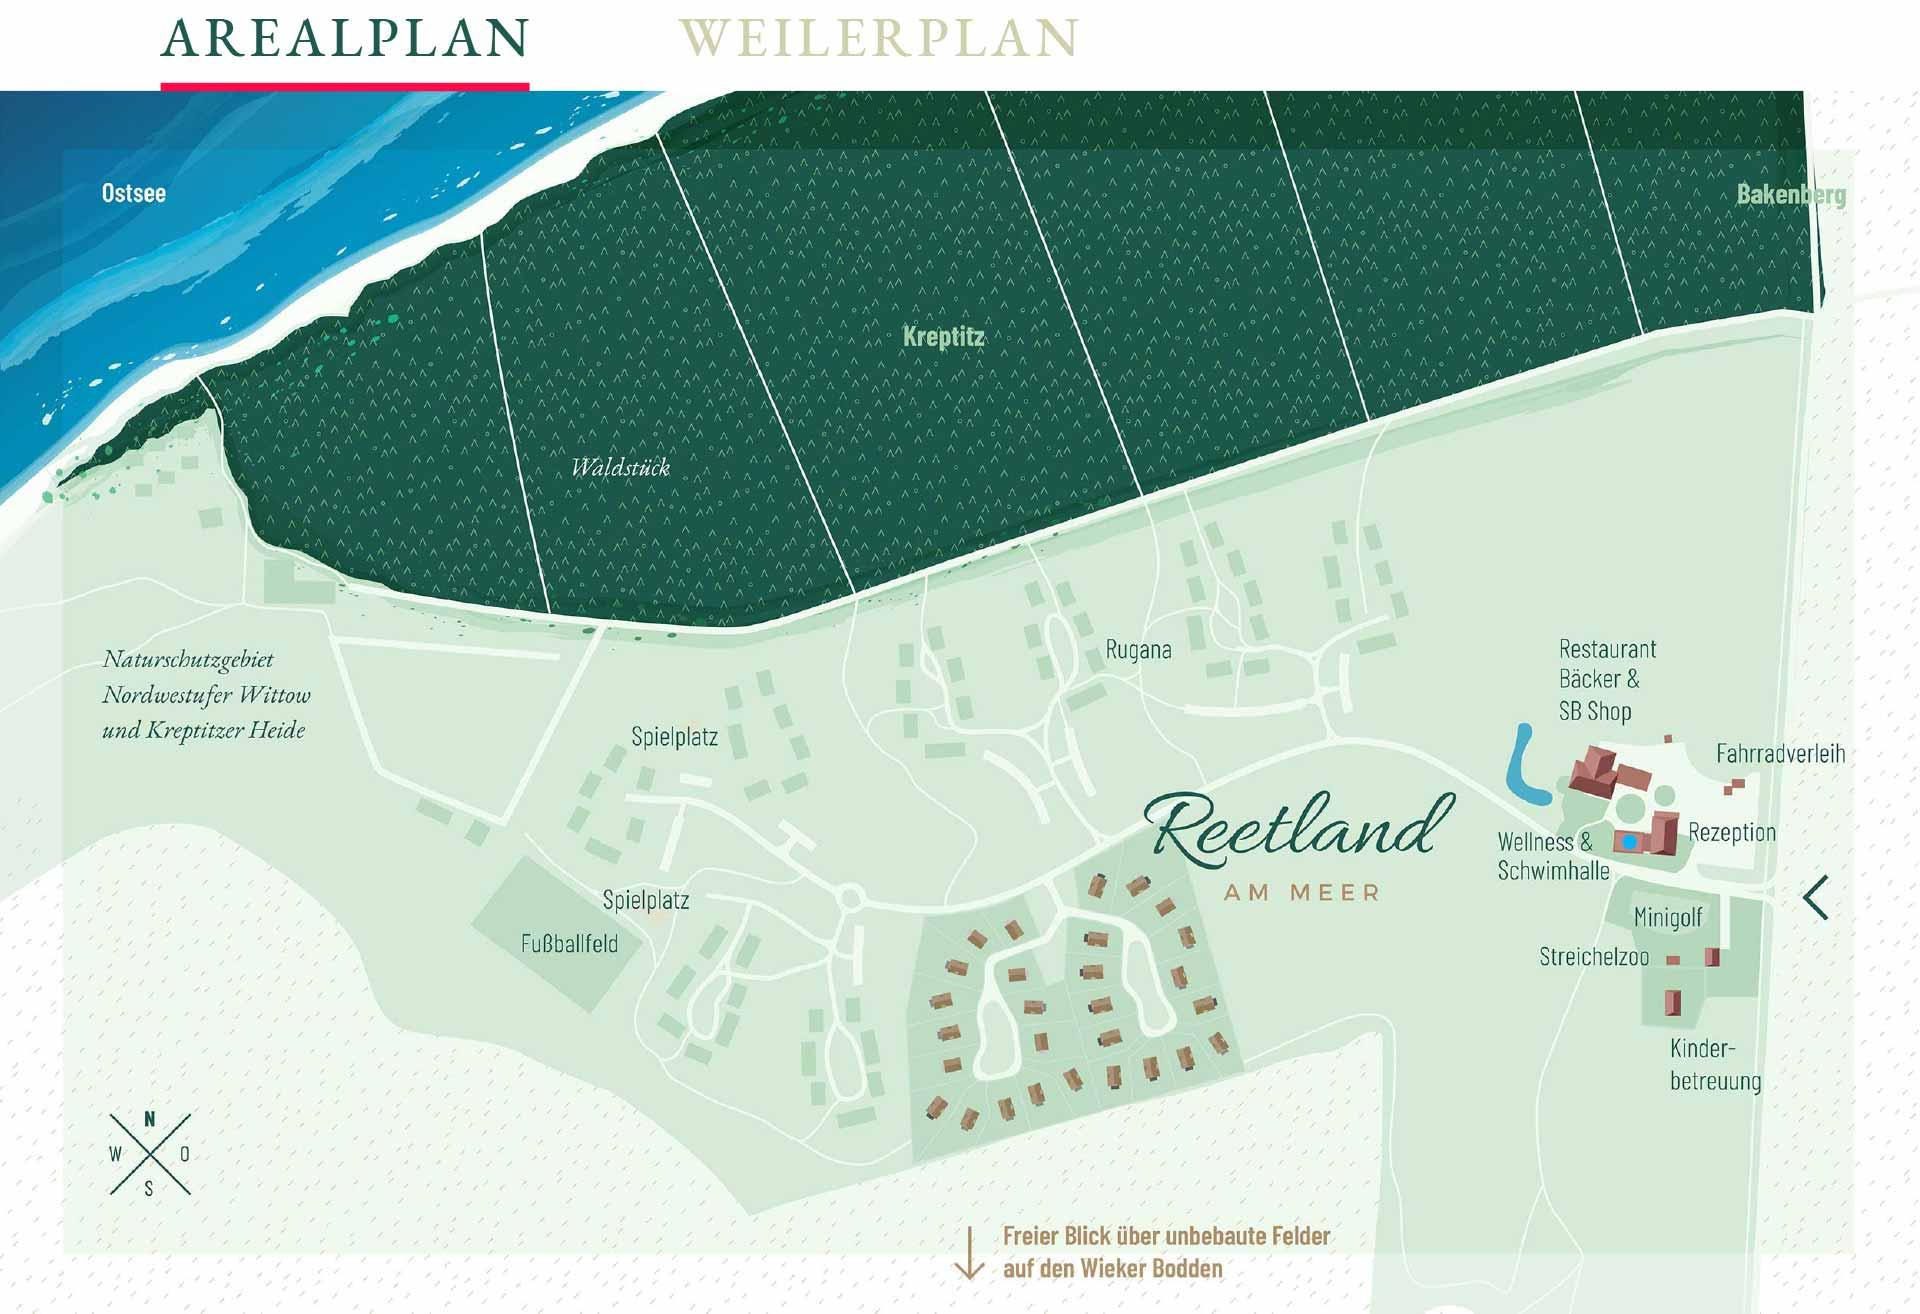 reetland-spread-1